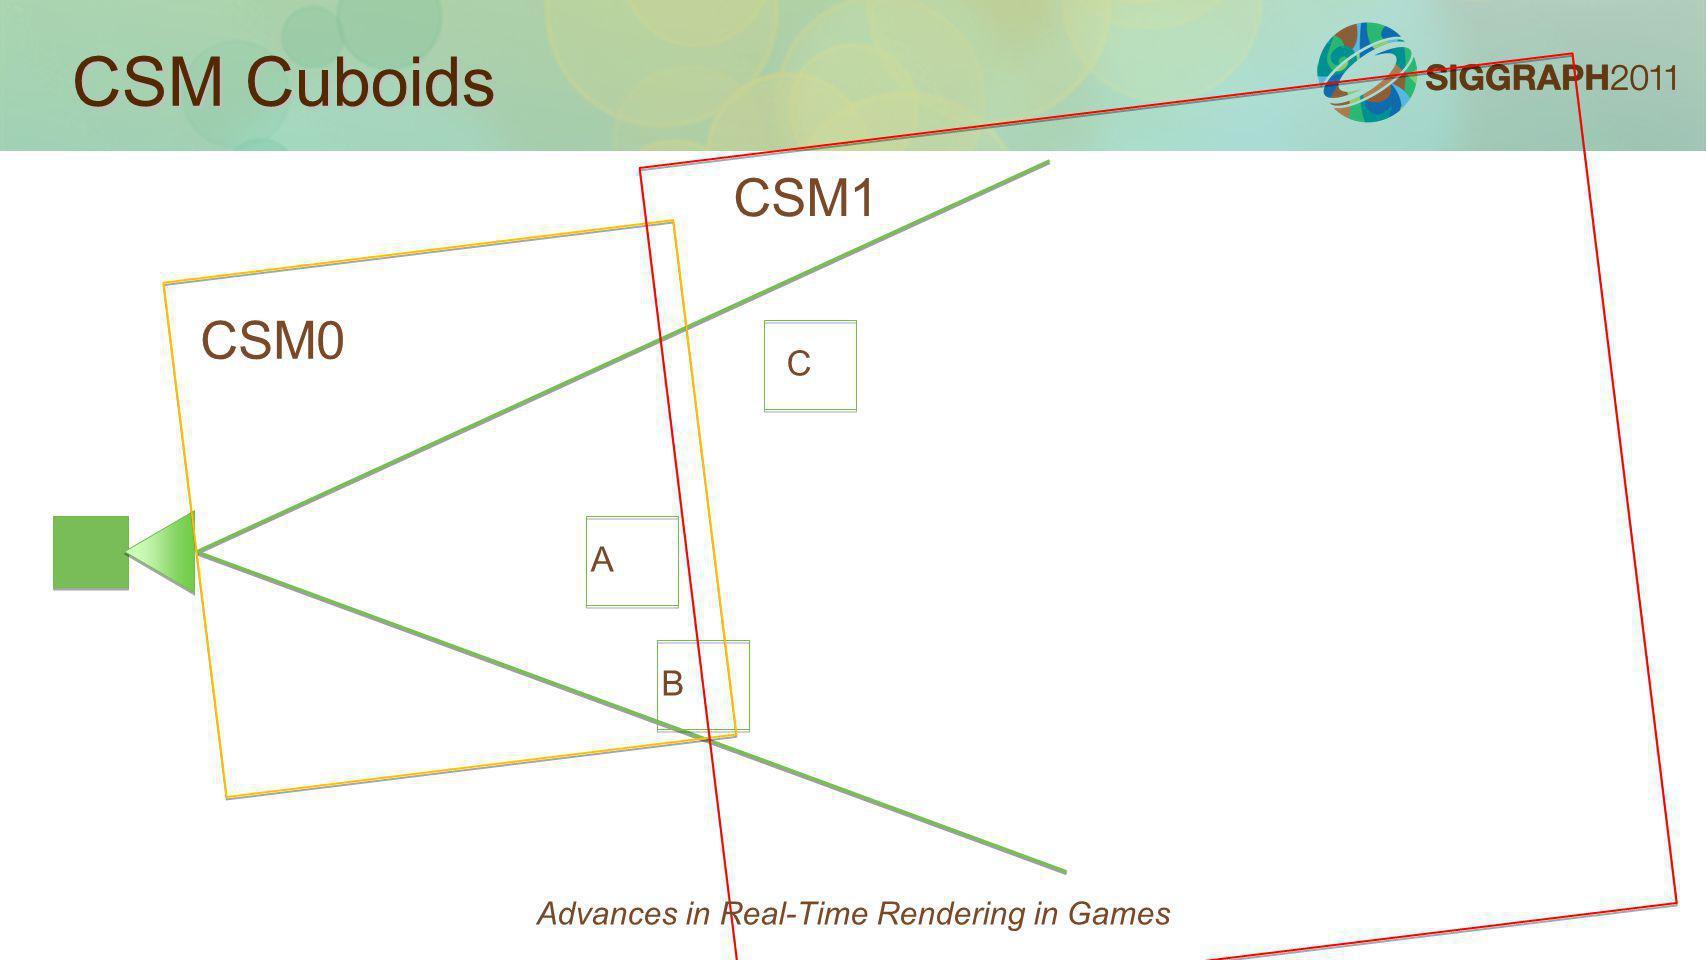 CSM Cuboids CSM0 CSM1 C A B Advances in Real-Time Rendering in Games